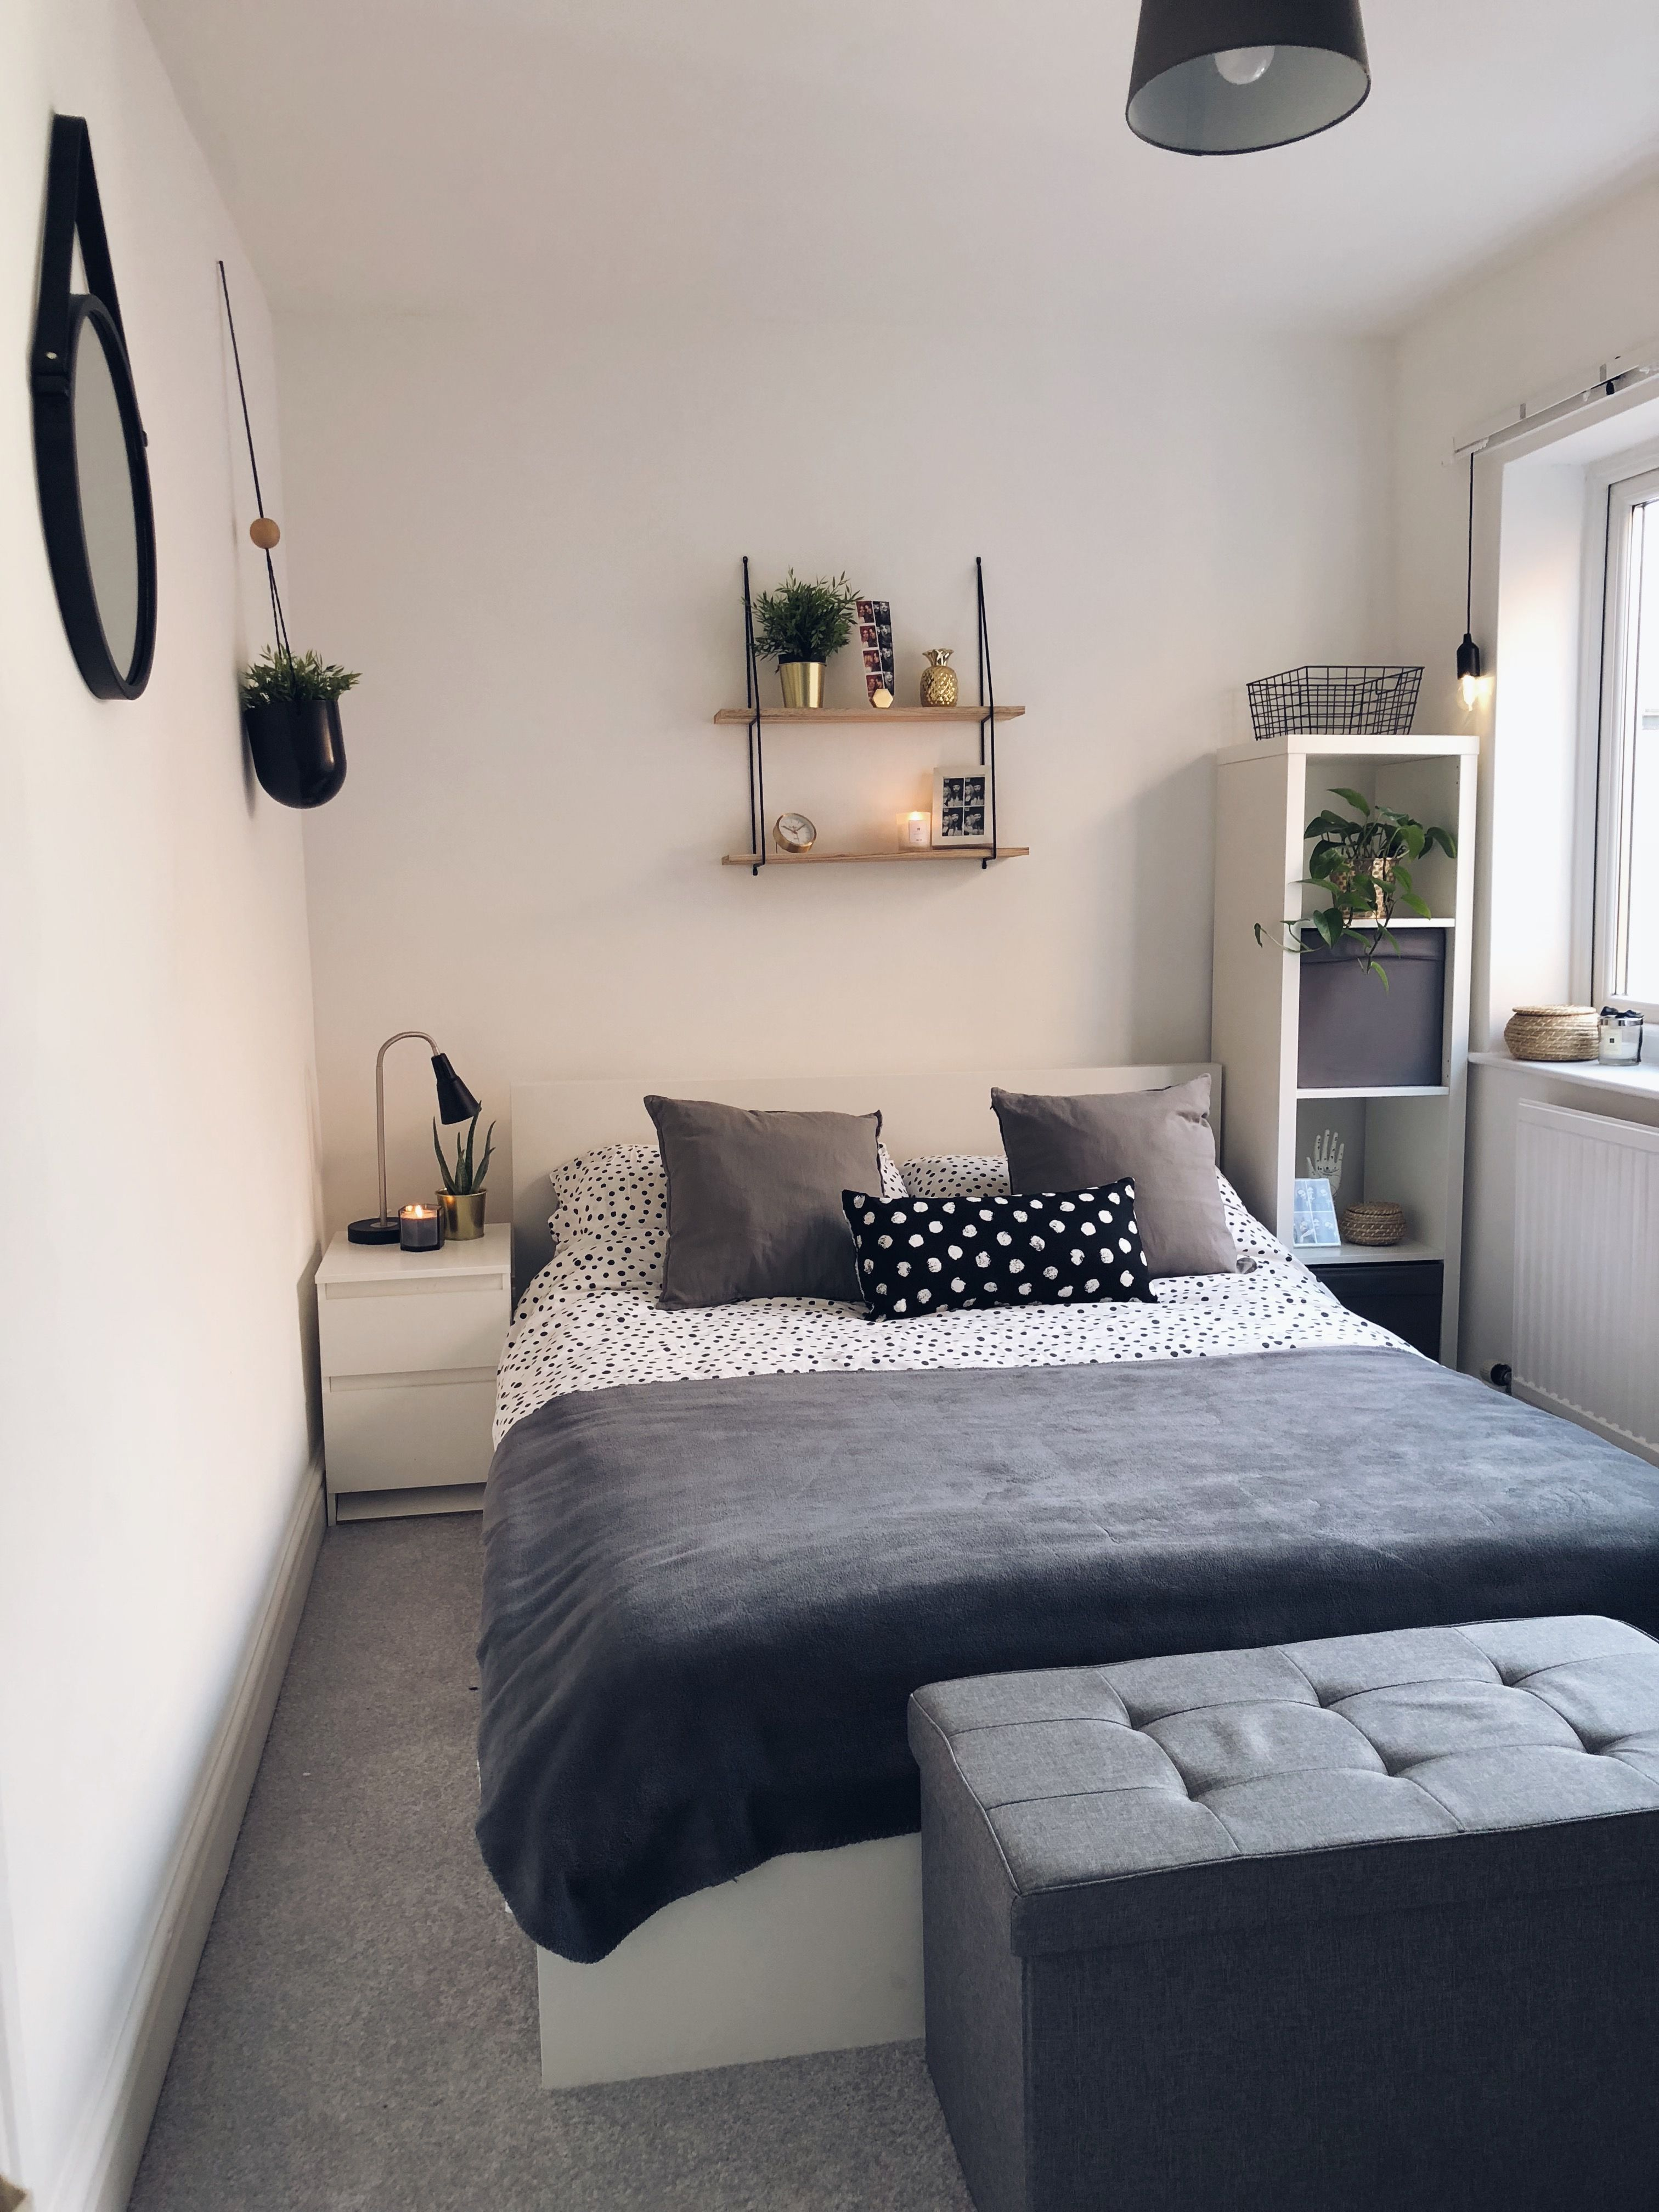 Cube Bookshelf In 2020 Small Bedroom Decor Small Apartment